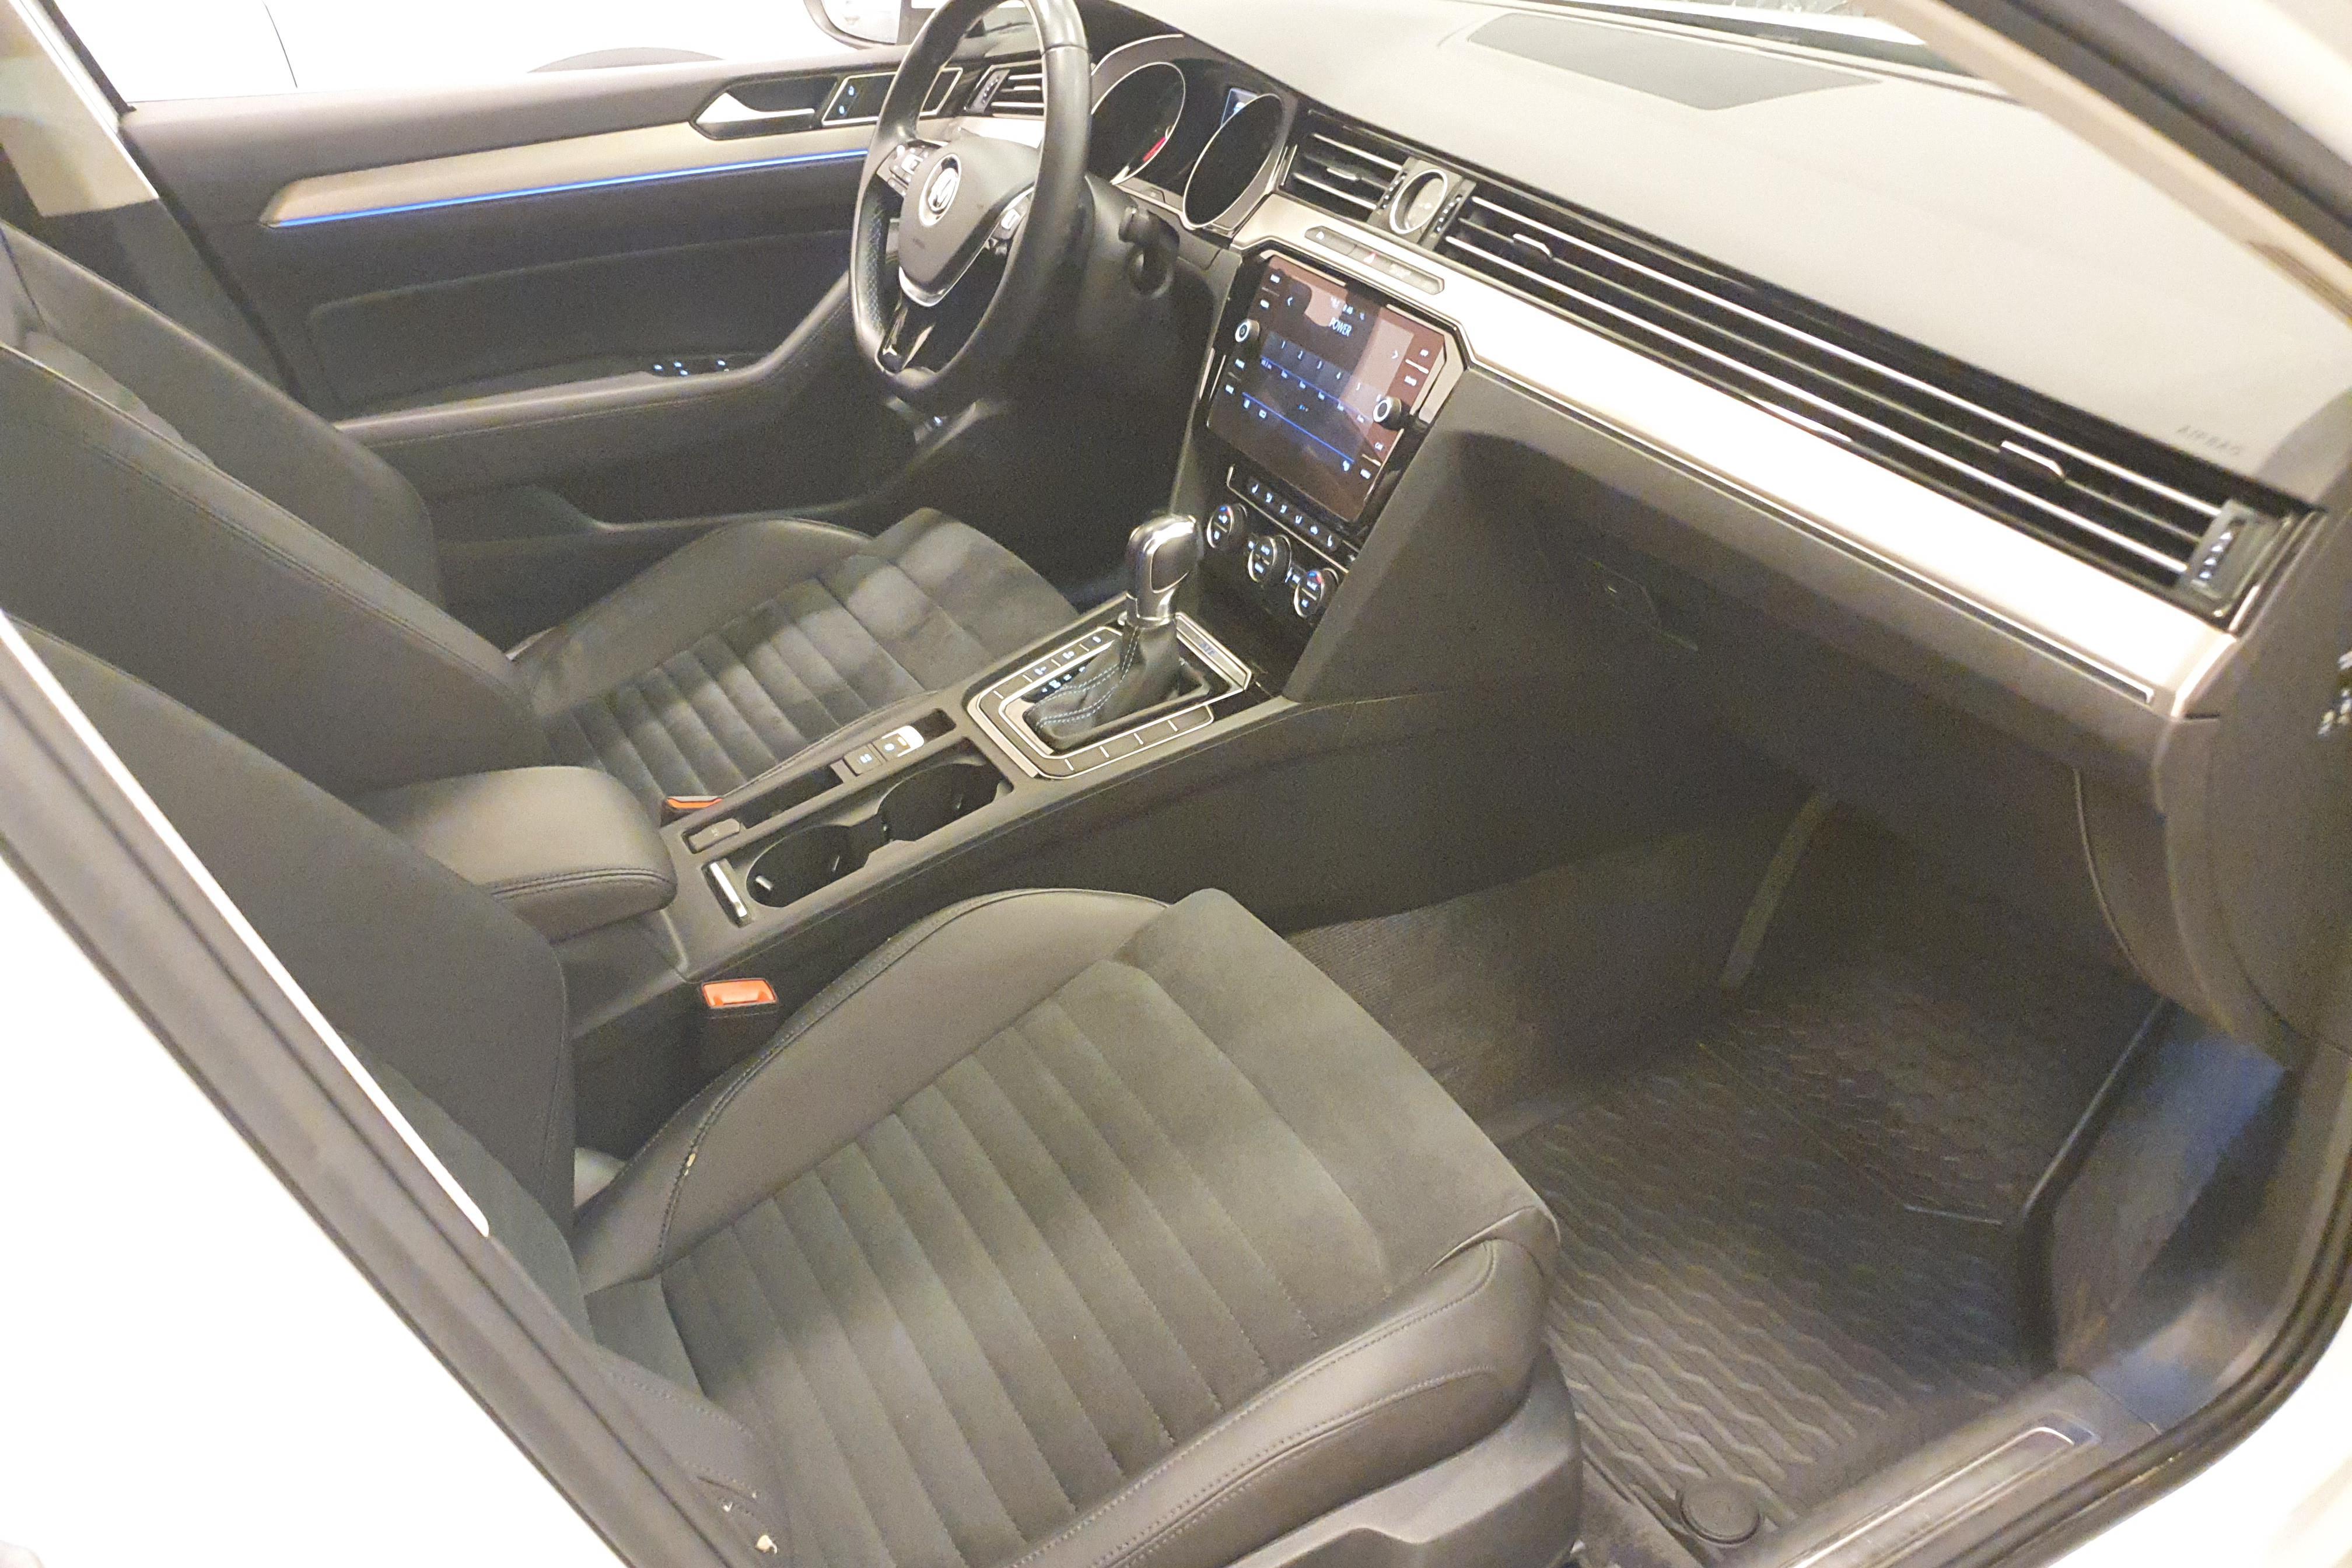 VW Passat 1.4 Plug-in-Hybrid Sportscombi (218hk) - 10 662 mil - Automat - vit - 2018